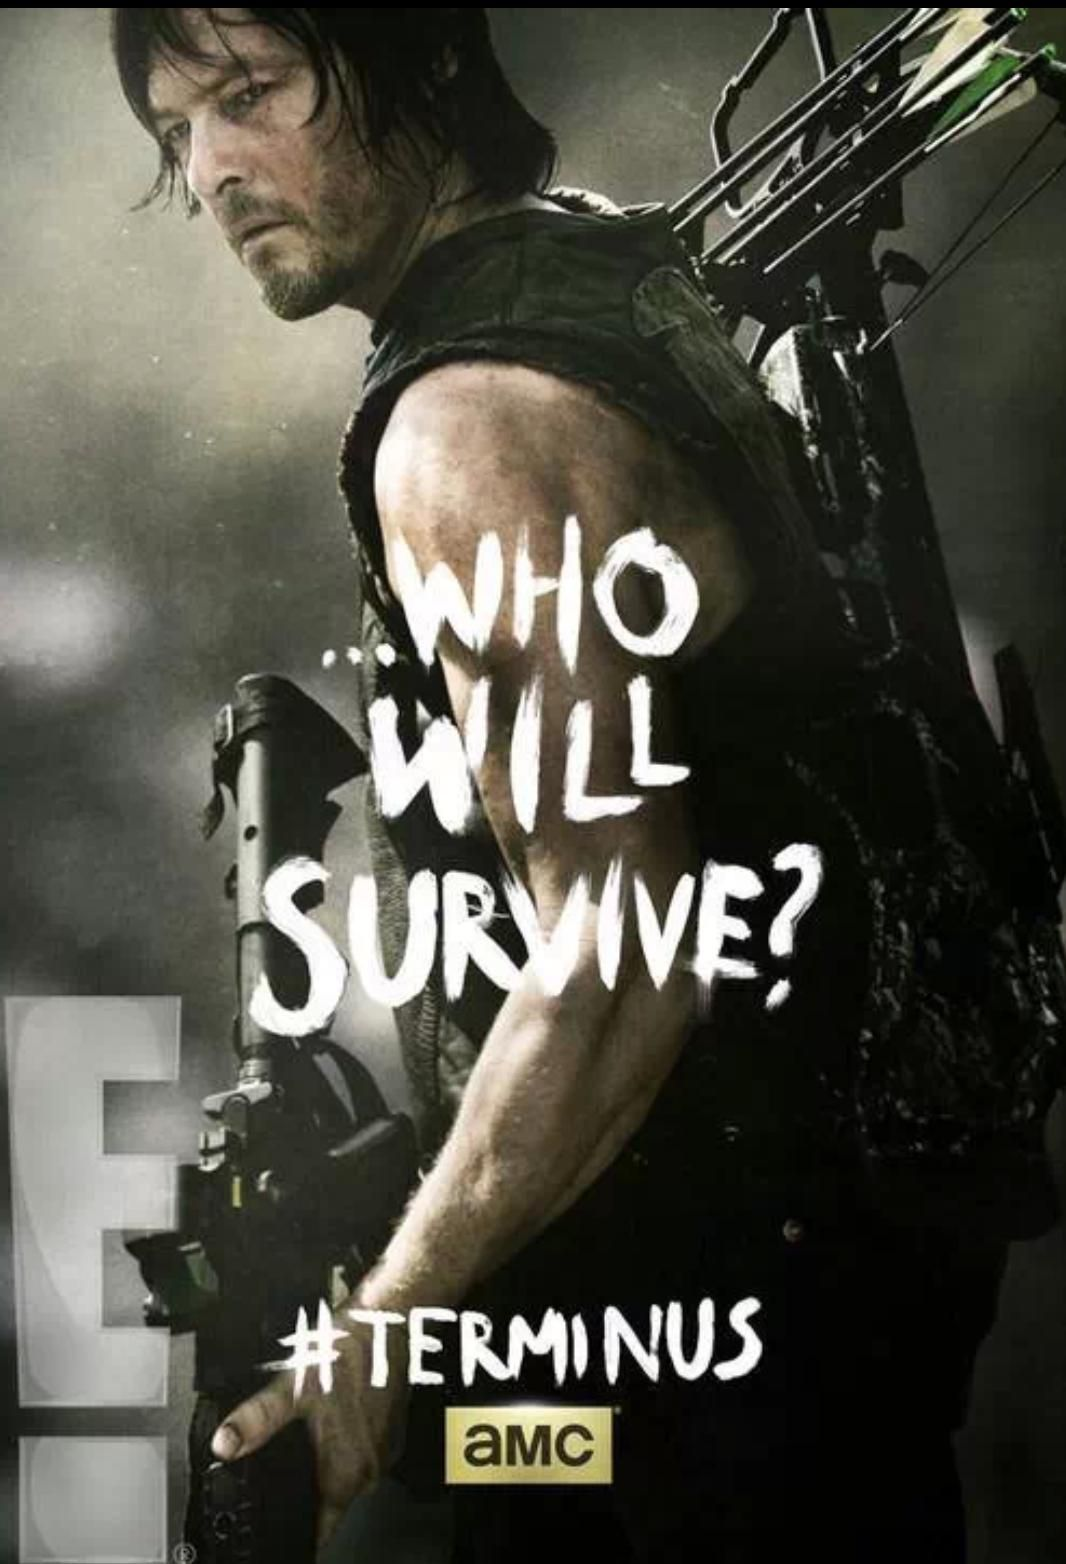 Daryl made it...